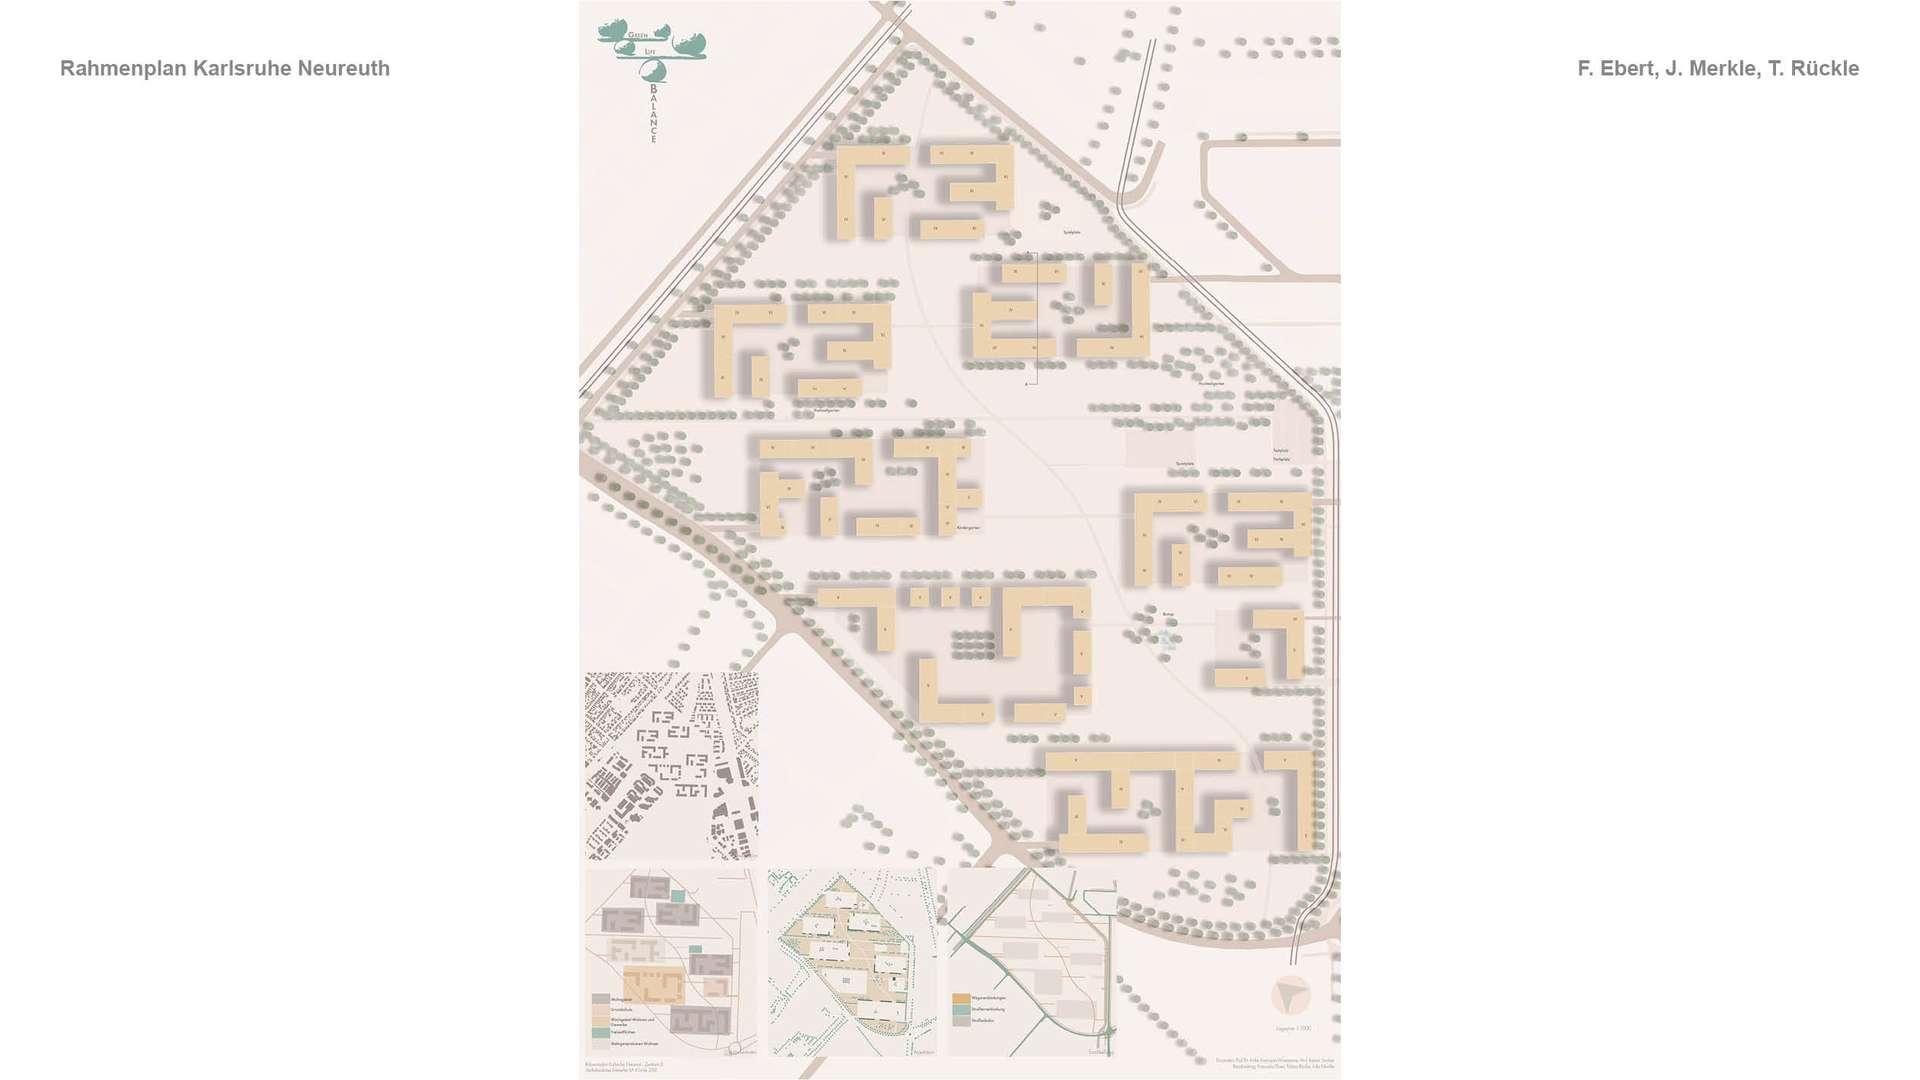 03 Rahmenkonzept Karlsruhe Neureuth